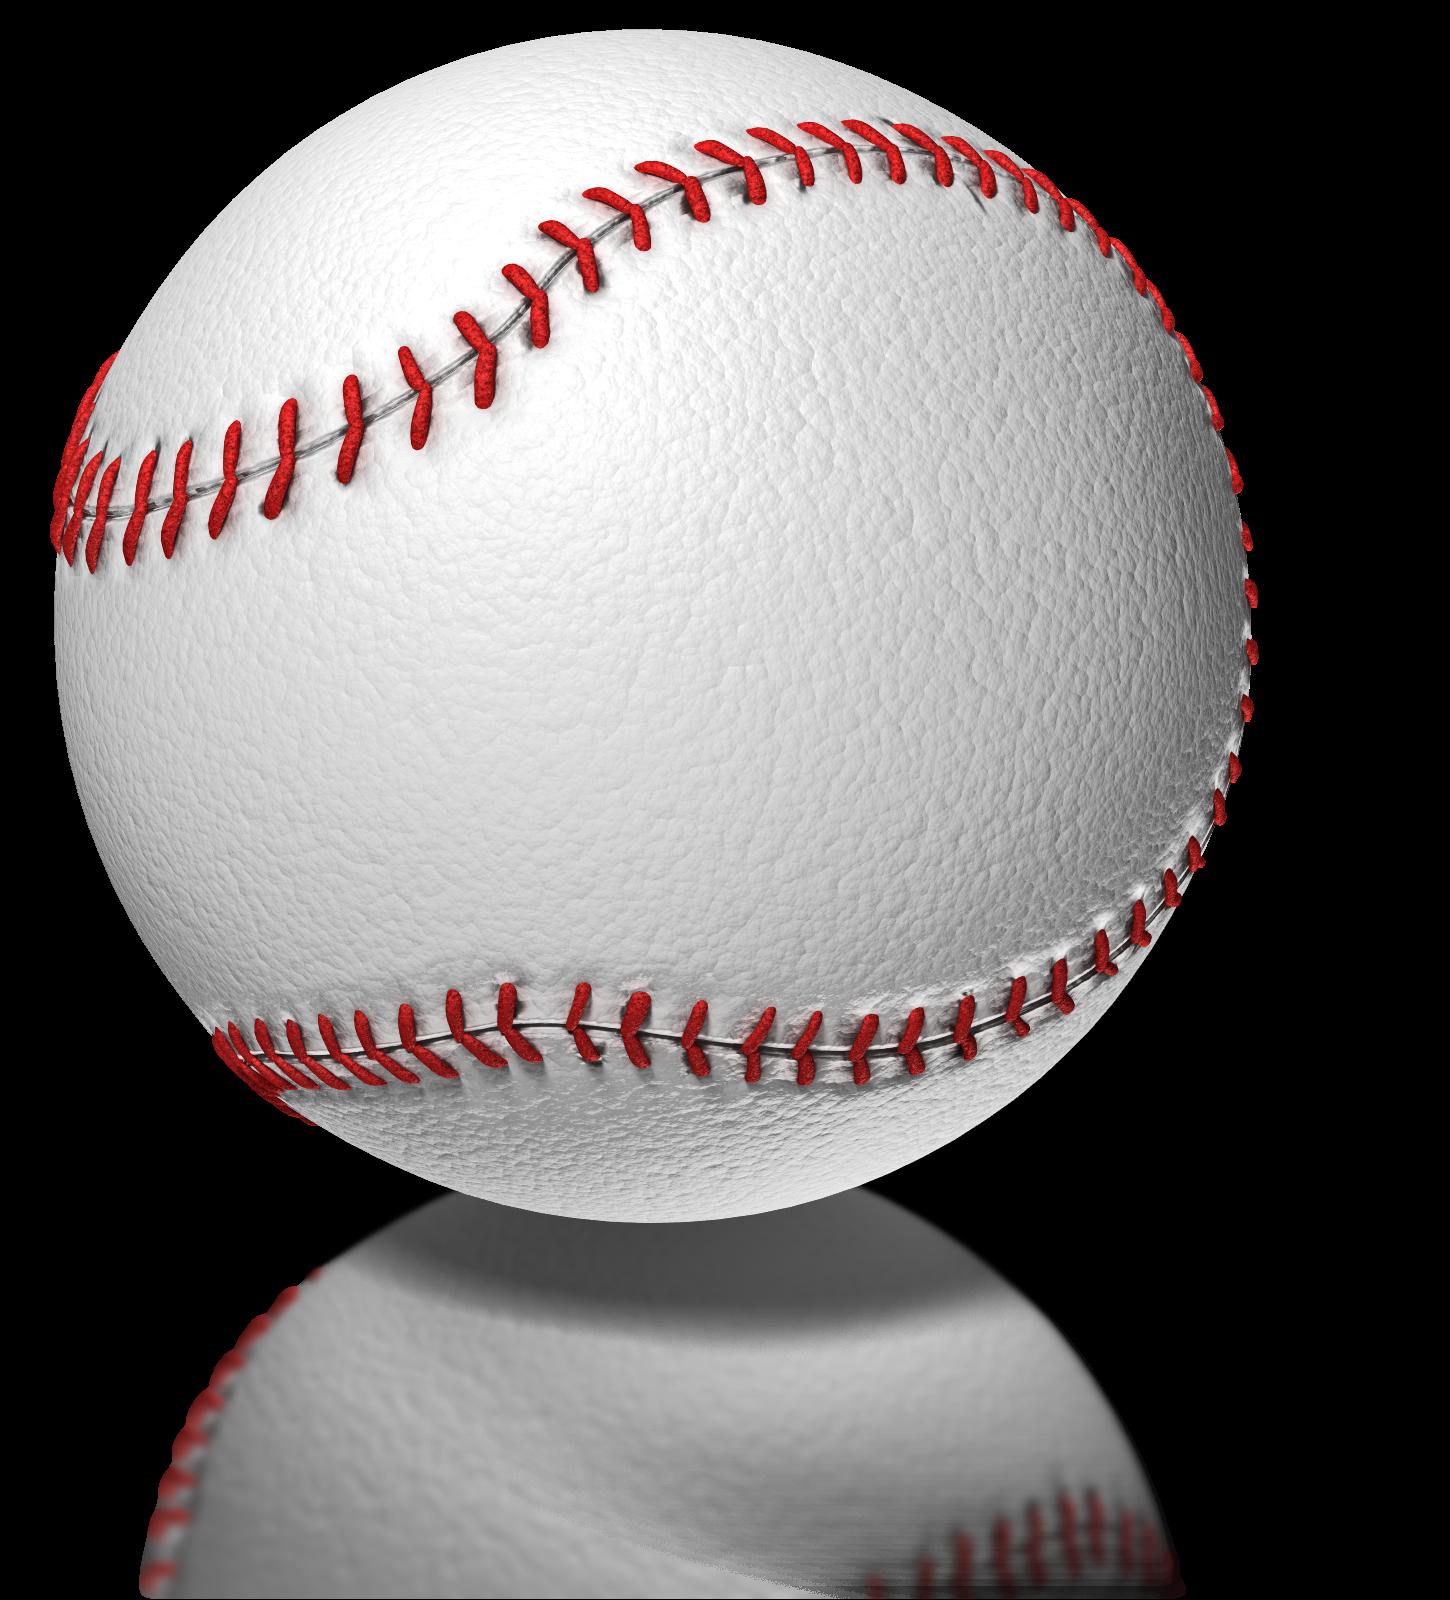 Baseball Image Transparent Clipart image #35355 - Baseball PNG